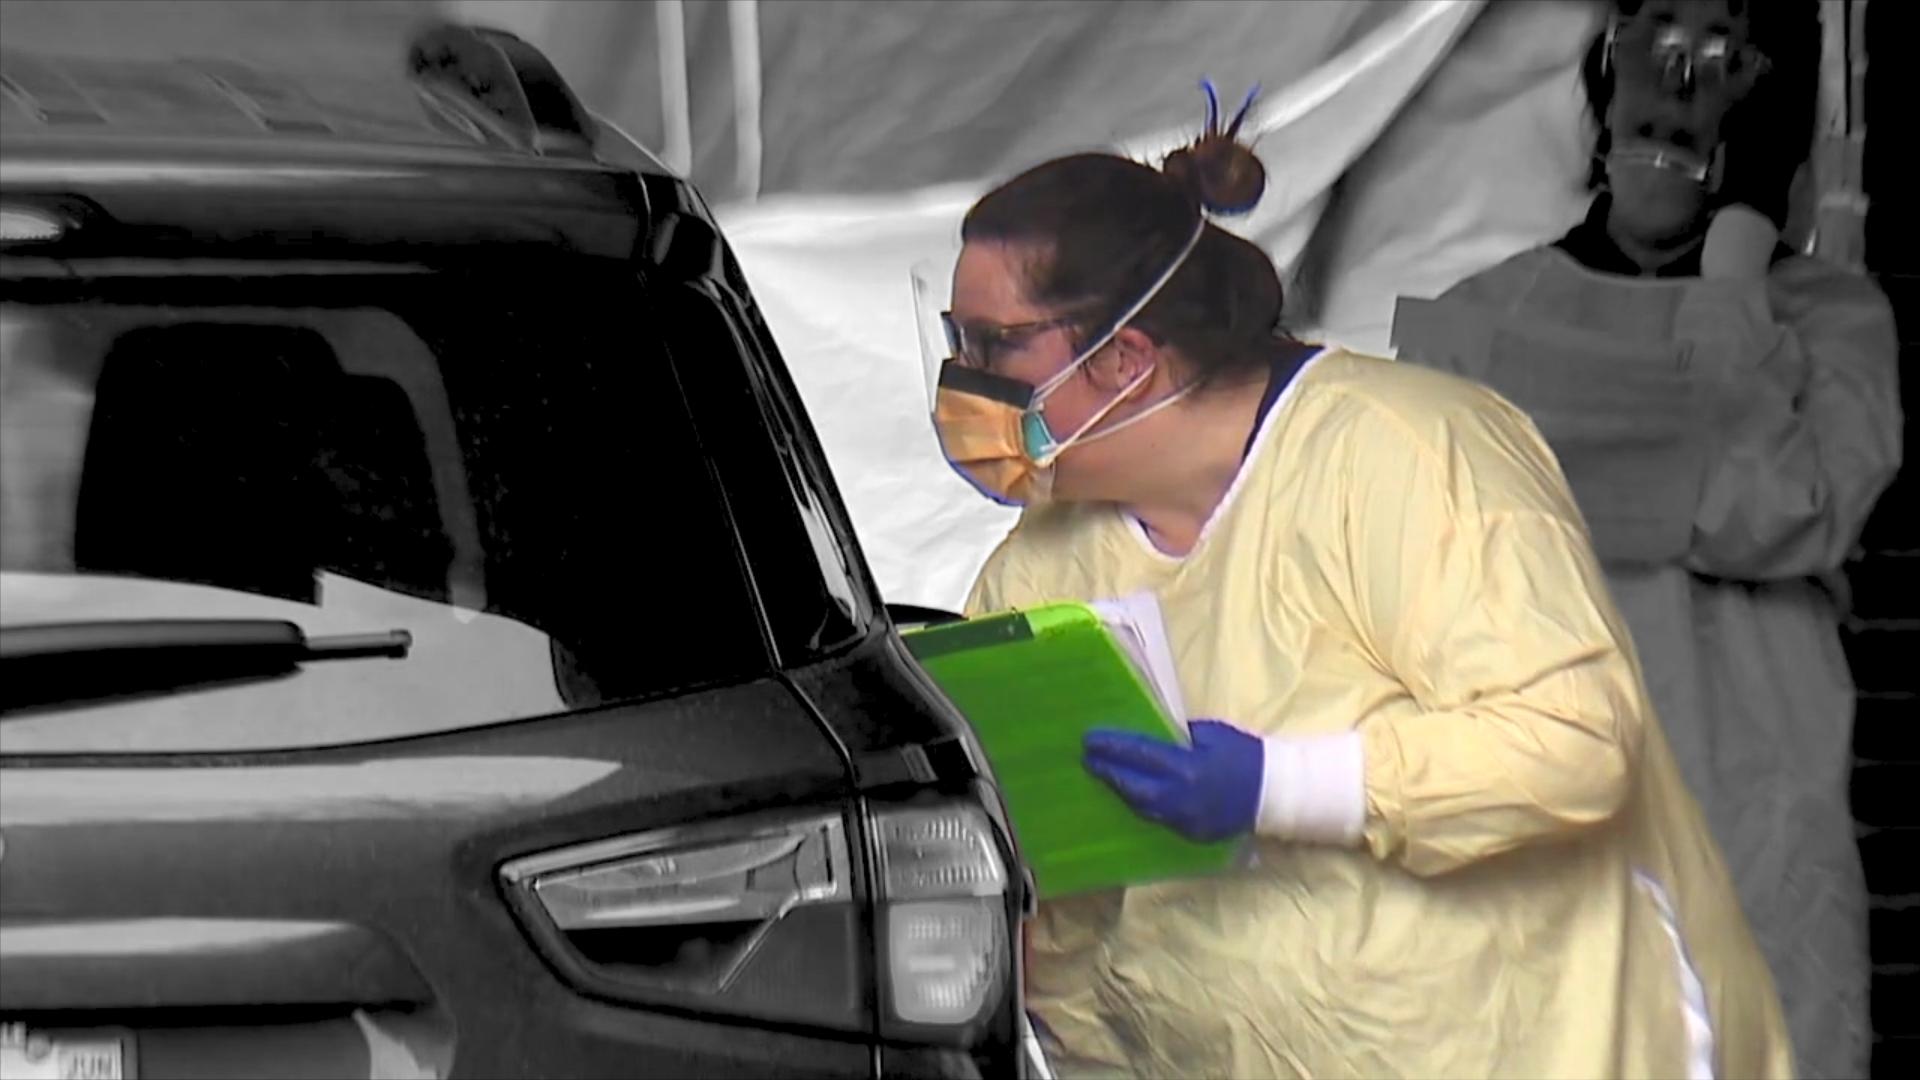 Nurse Car BW_00000.png